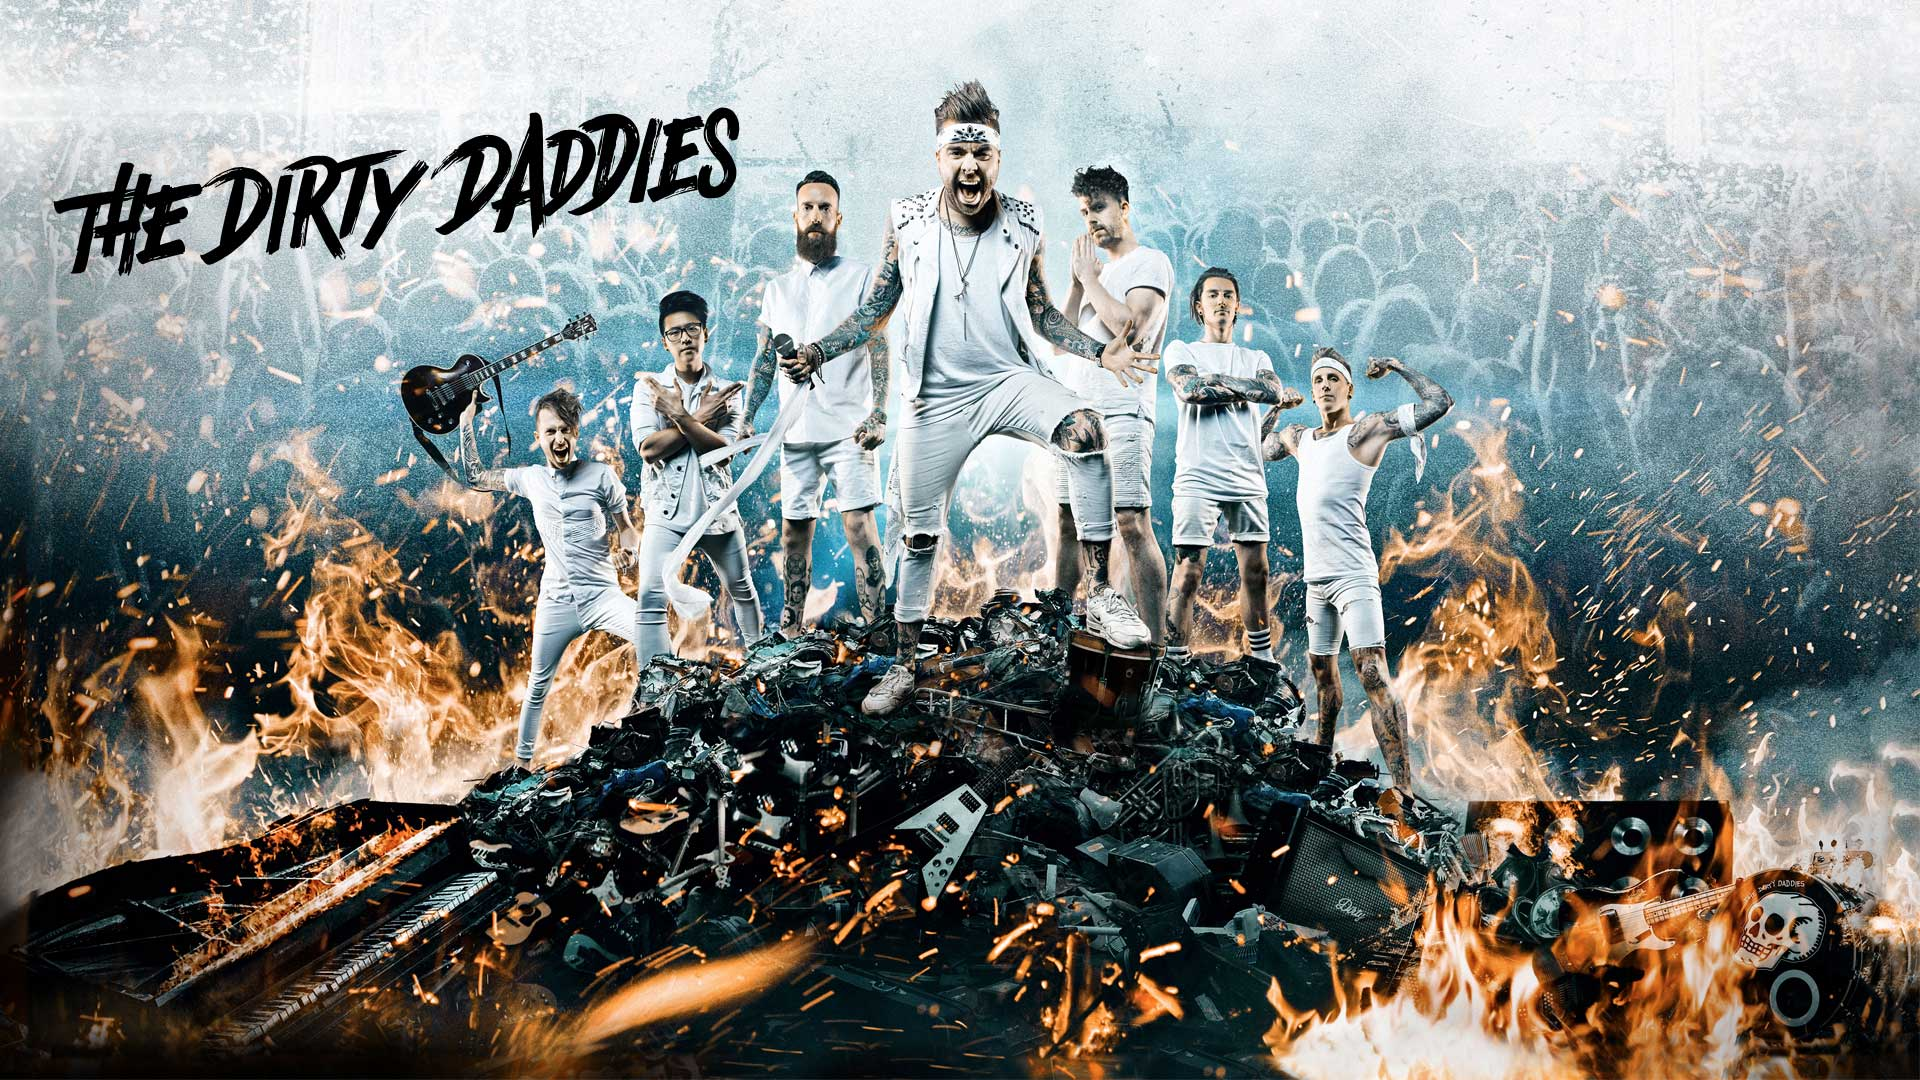 The Dirty Daddies 14 september 2018